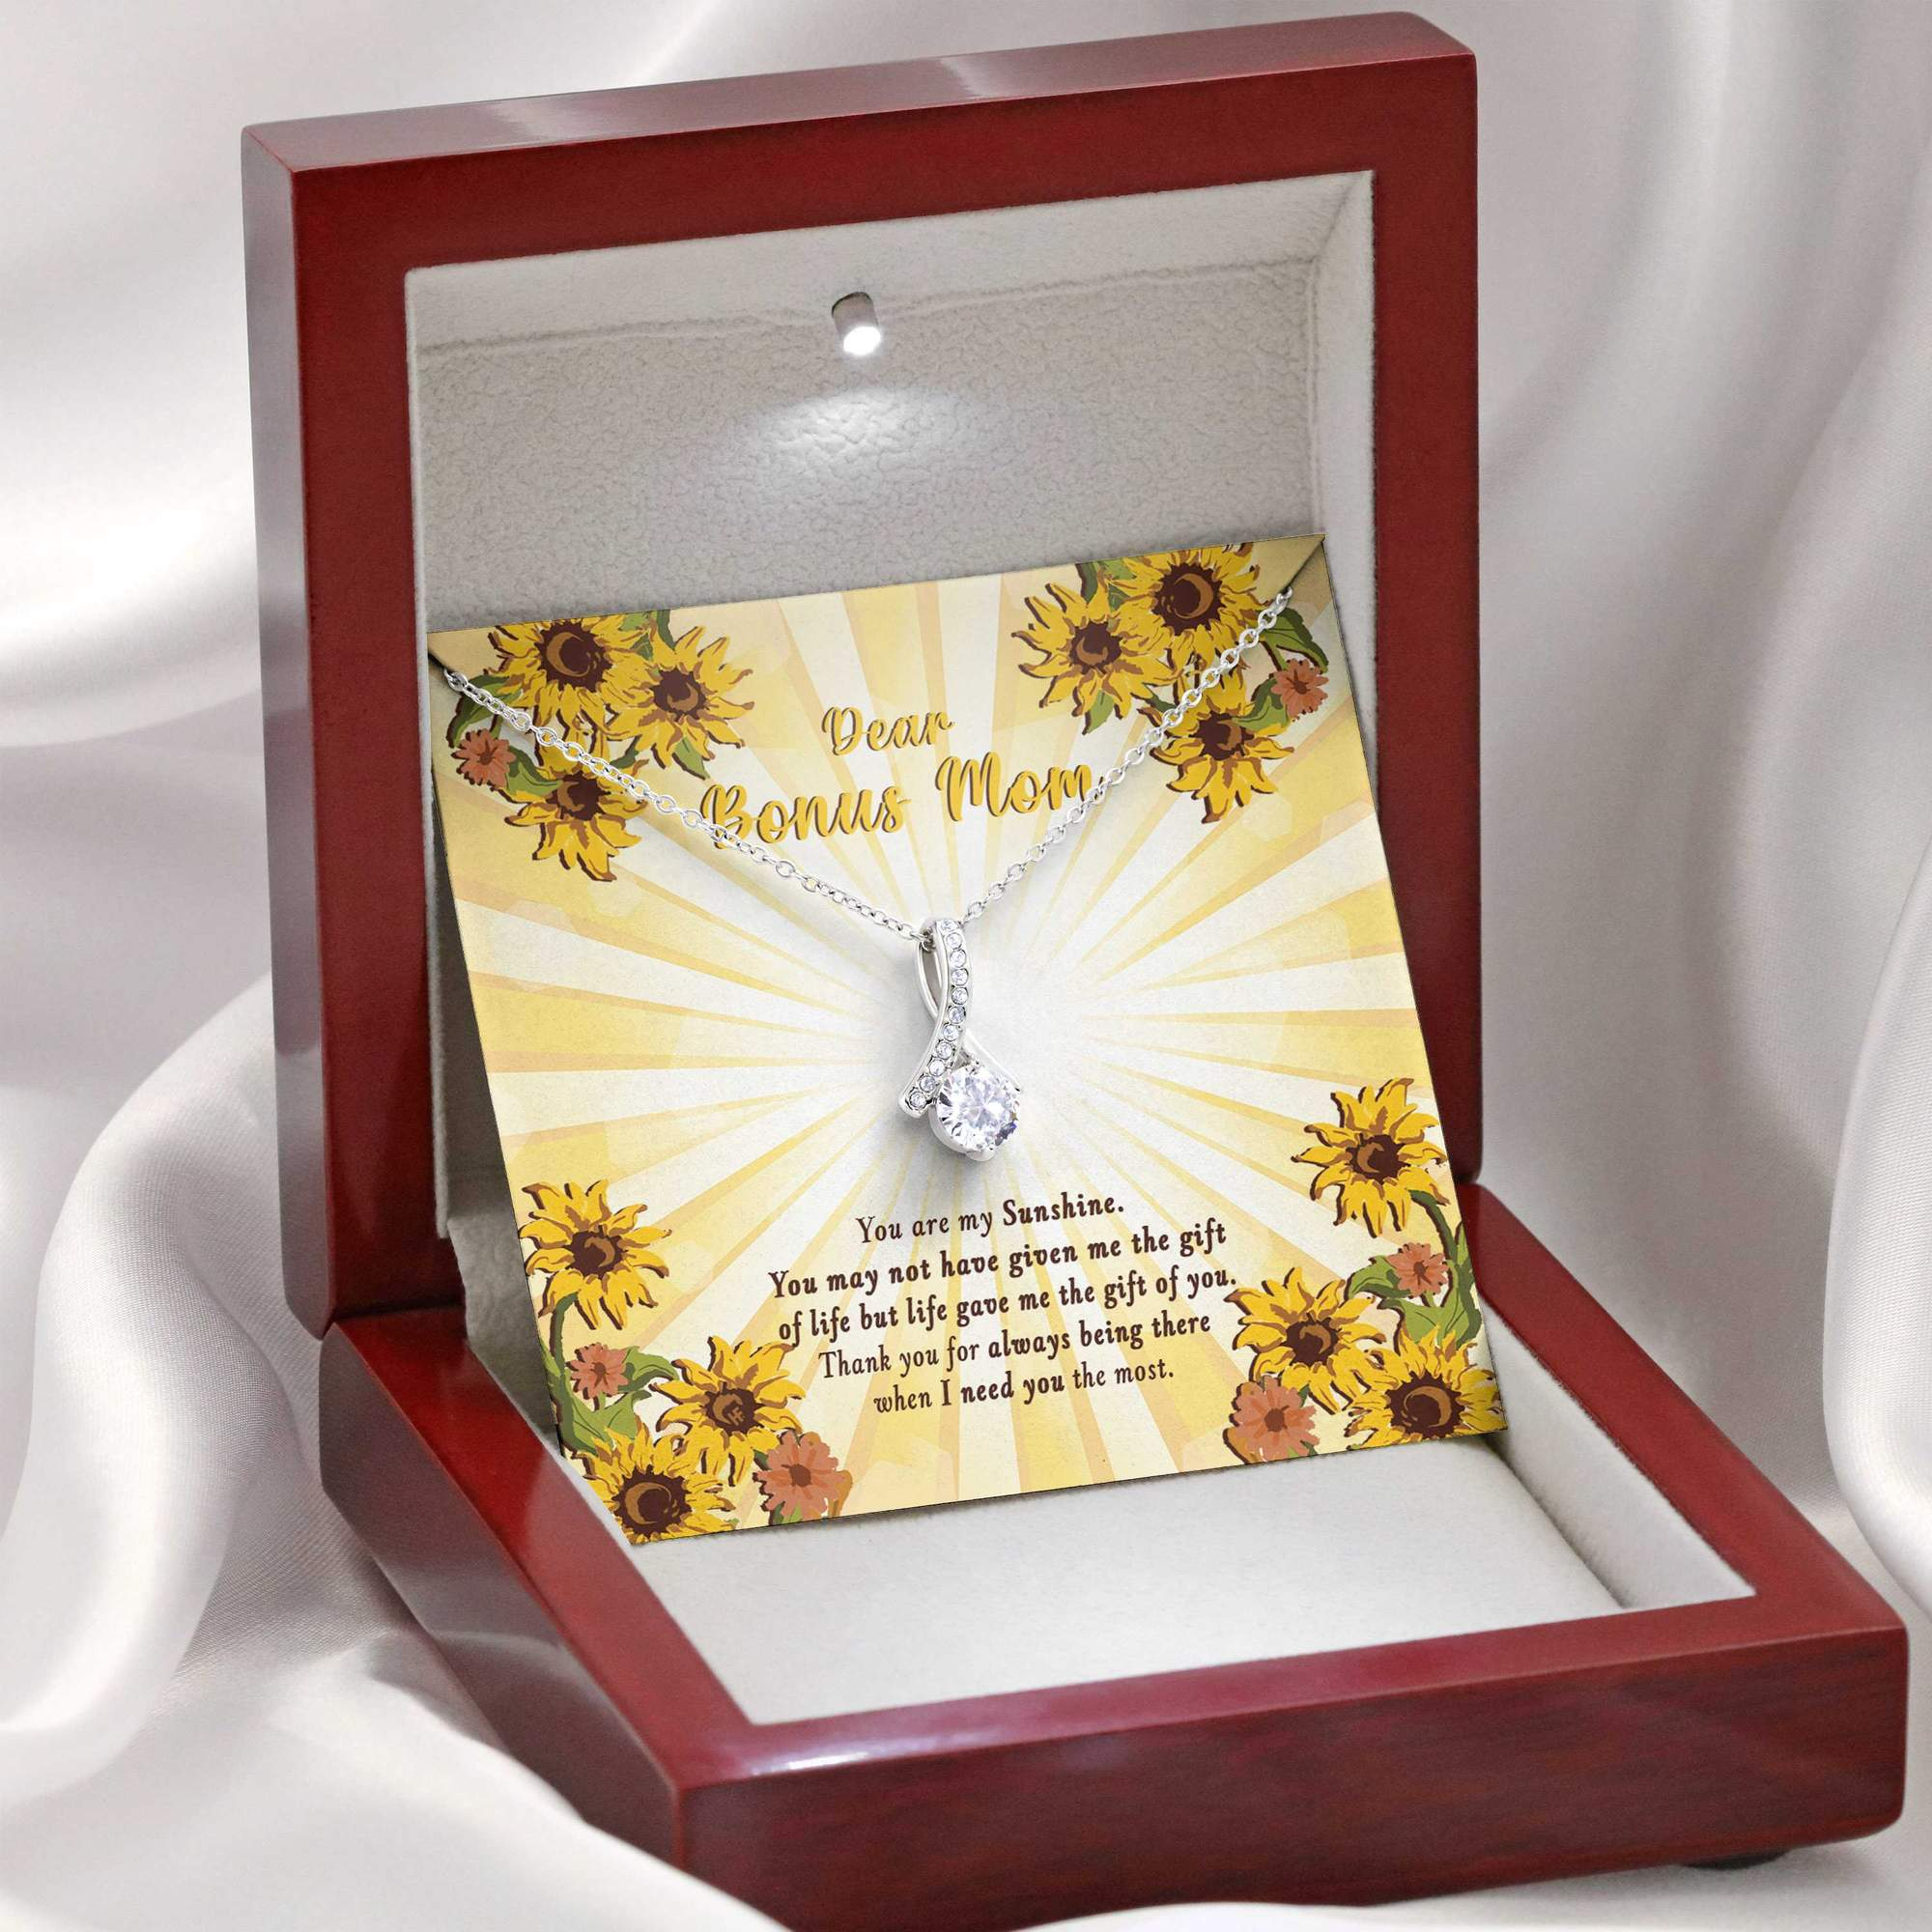 Dear Bonus Mom You Are My Sunshine Alluring Necklace